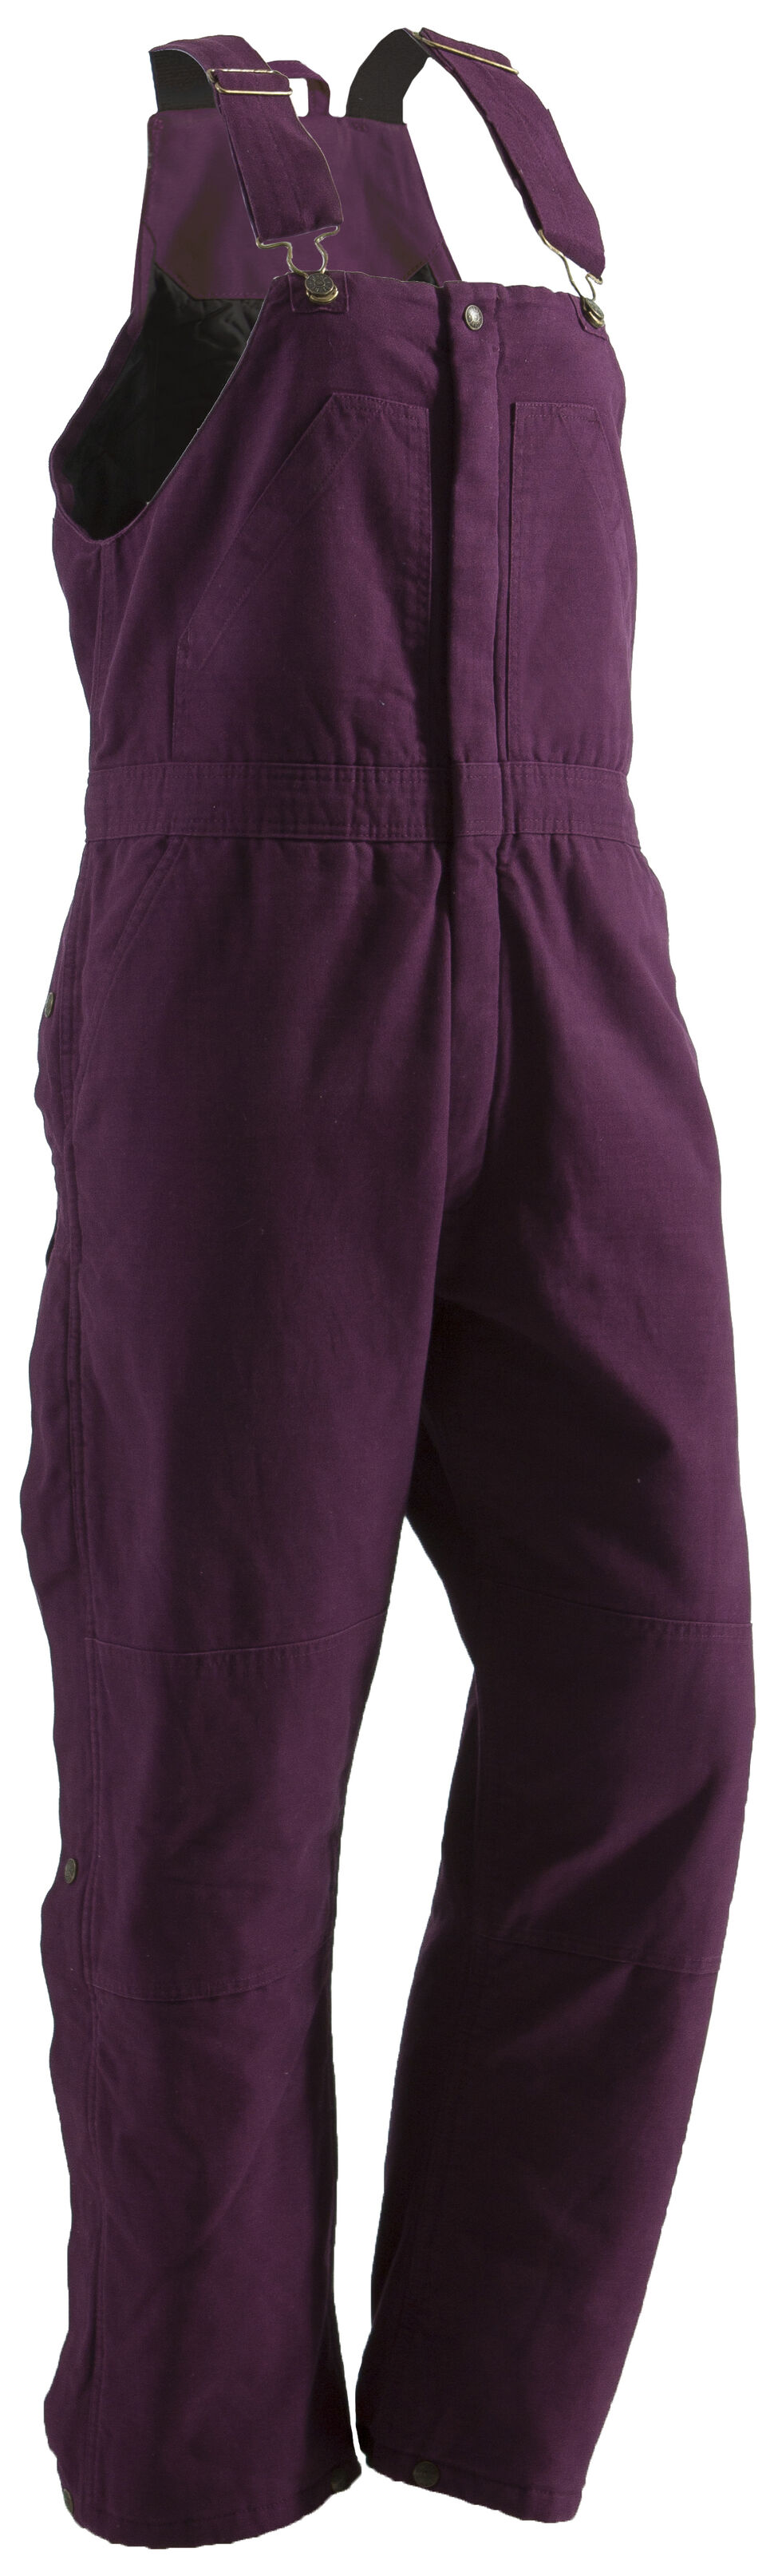 Berne Ladies Washed Insulated Bib Overalls - Reg. Tall, Plum, hi-res